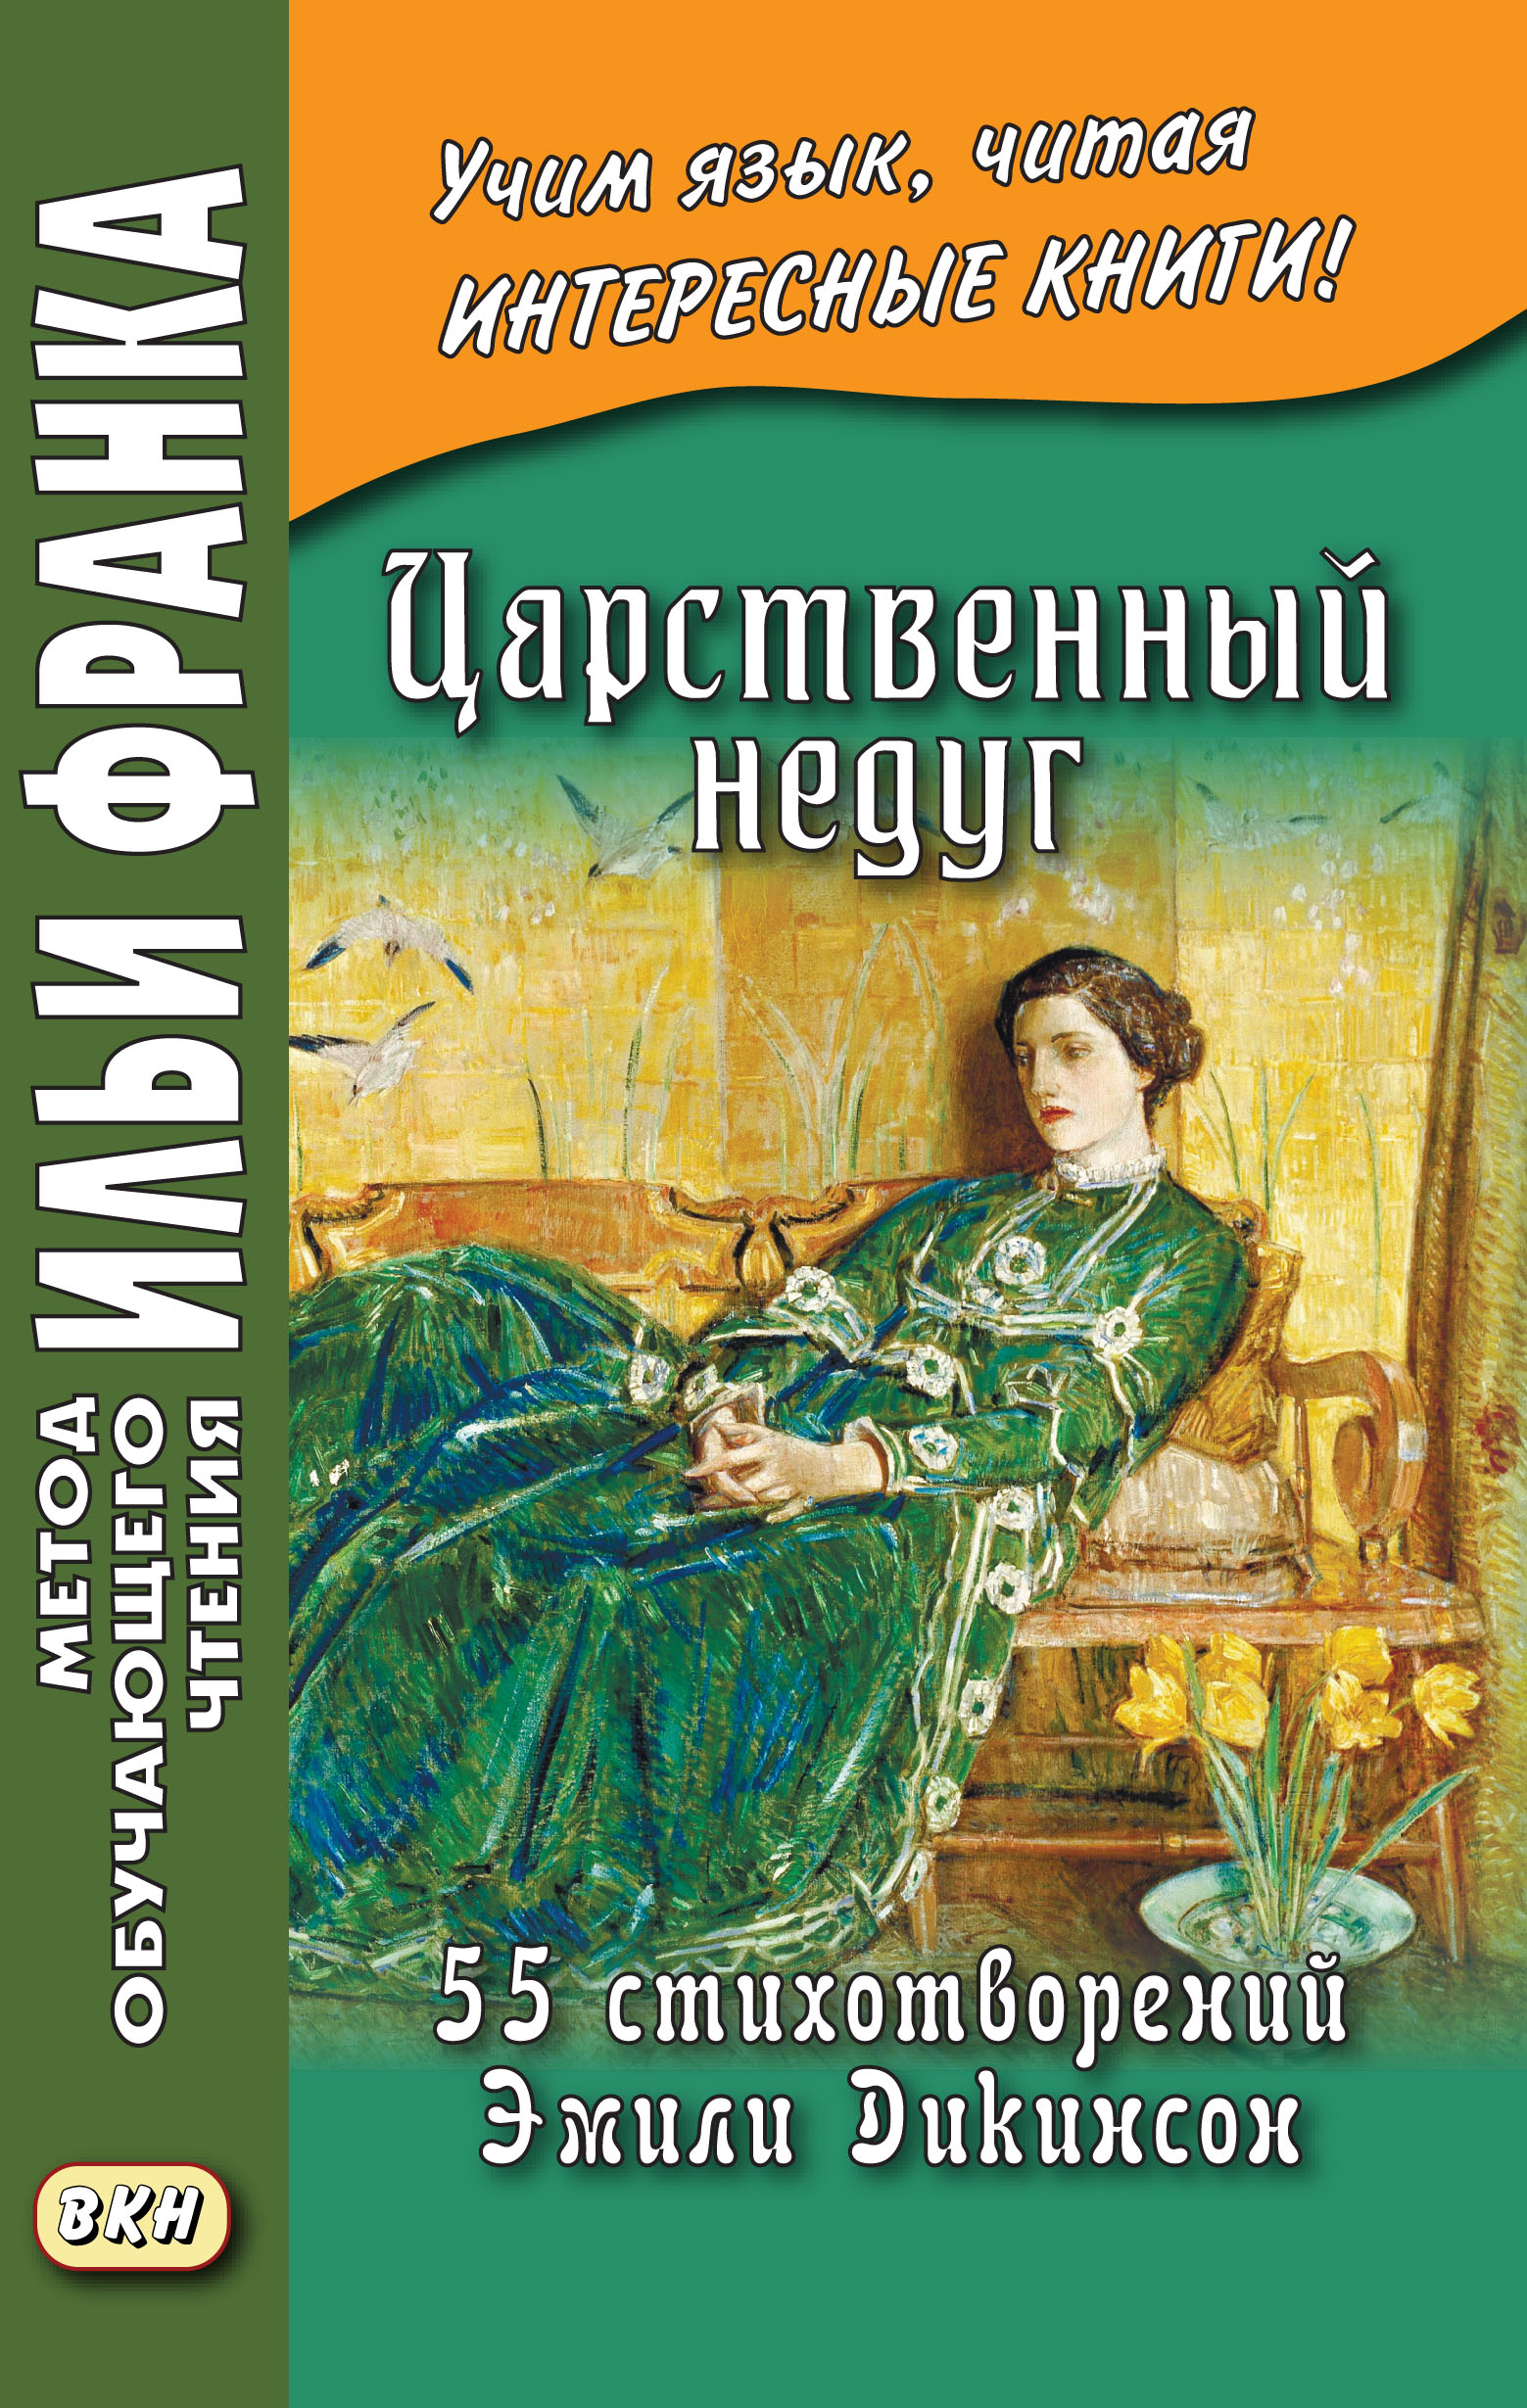 Эмили Дикинсон Царственный недуг. 55 стихотворений Эмили Дикинсон / An Imperial Affliction. 55 Poems of Emily Dickinson (1830–1886)